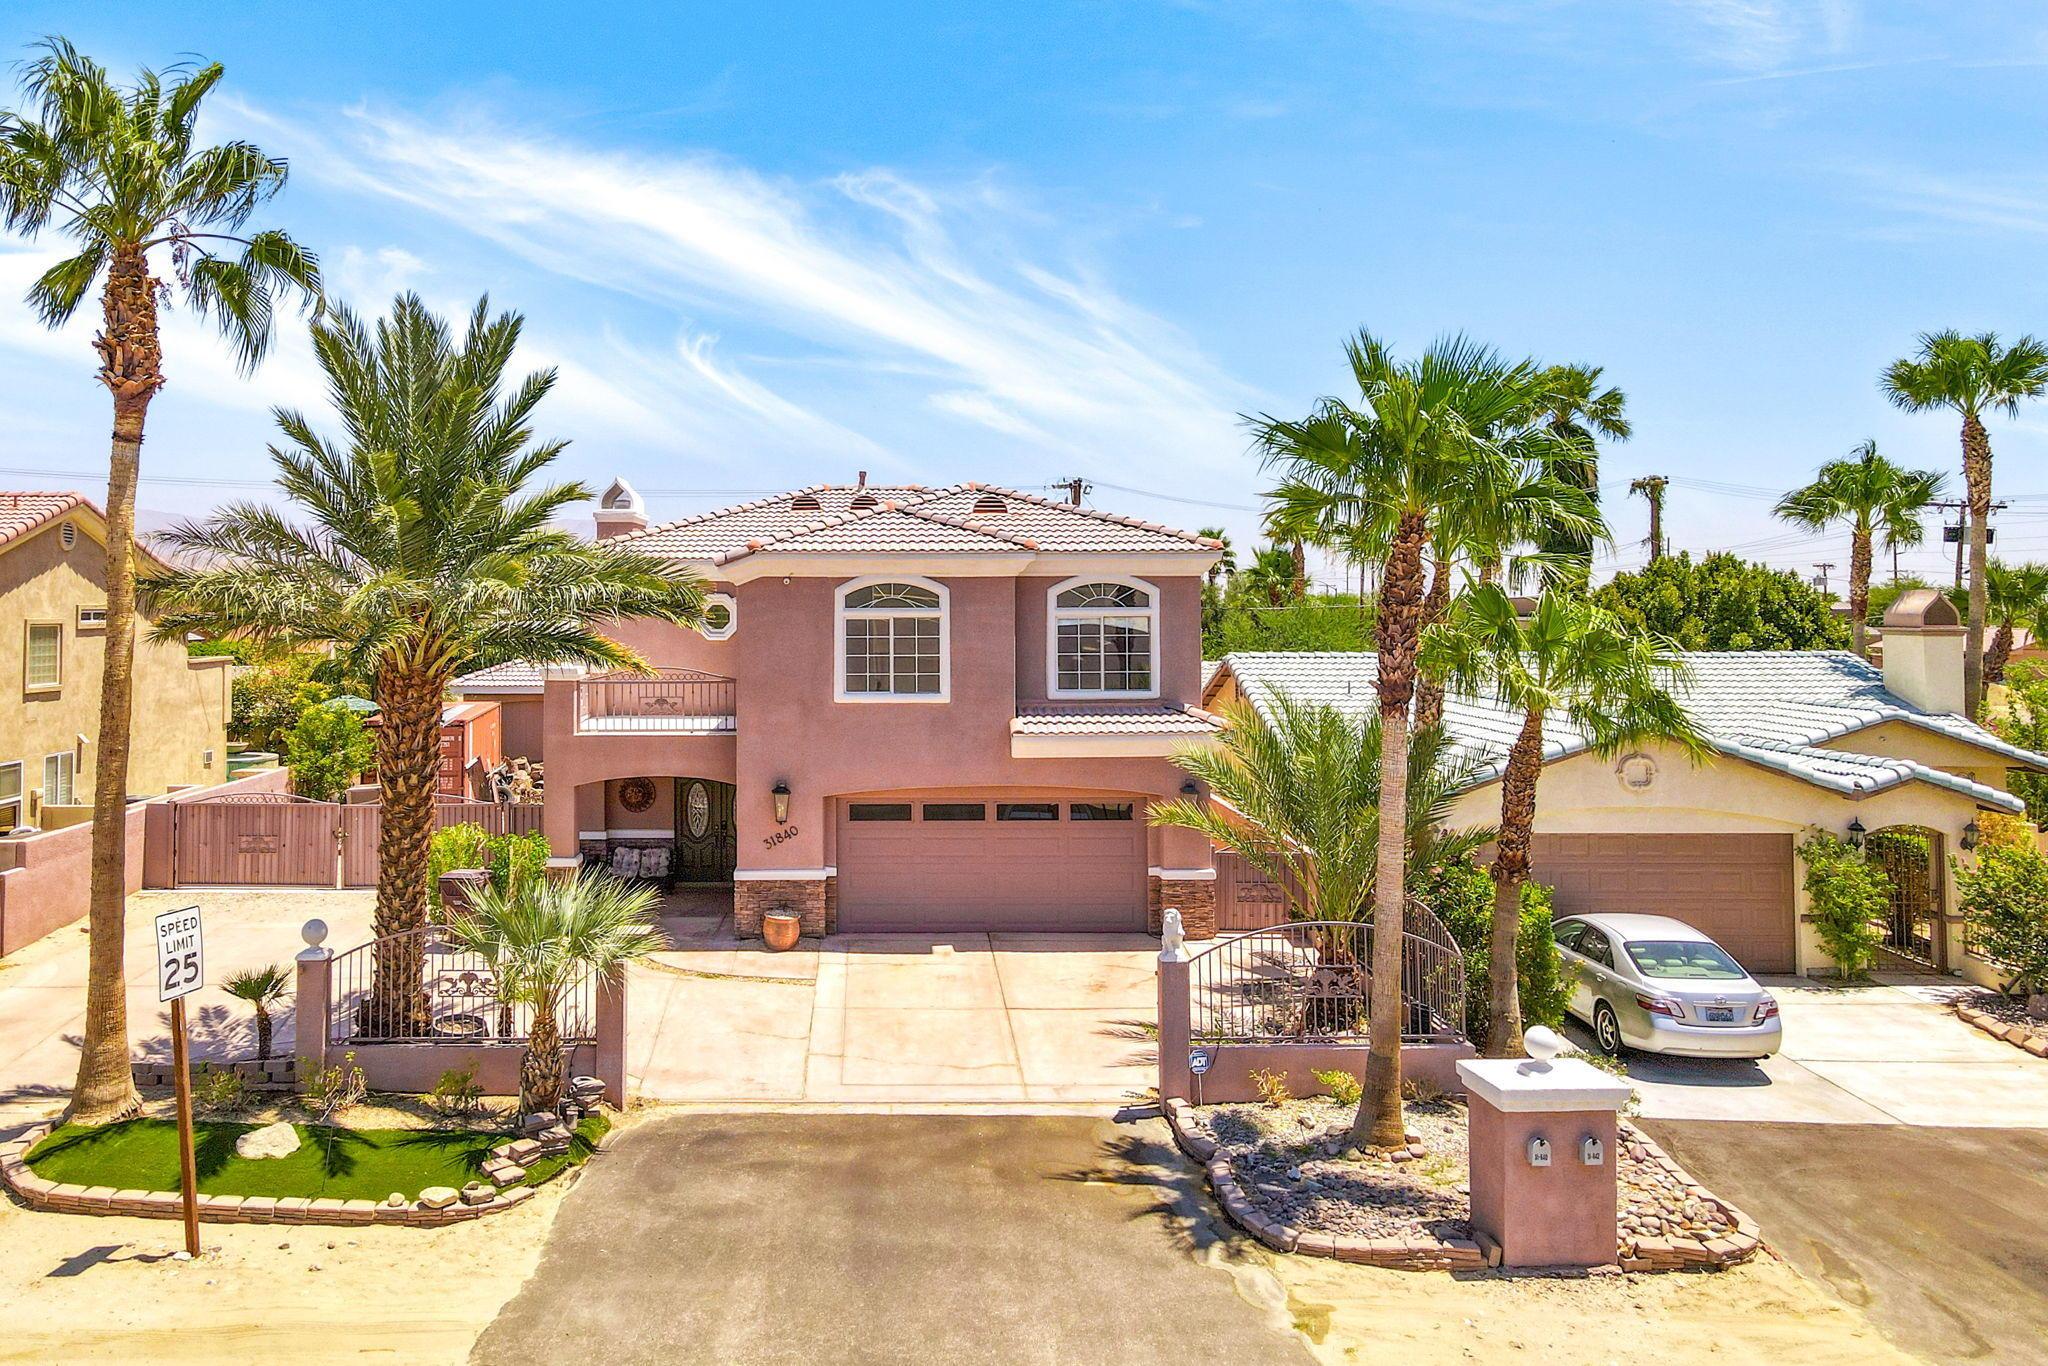 Photo of 31840 Sierra Del Sol, Thousand Palms, CA 92276